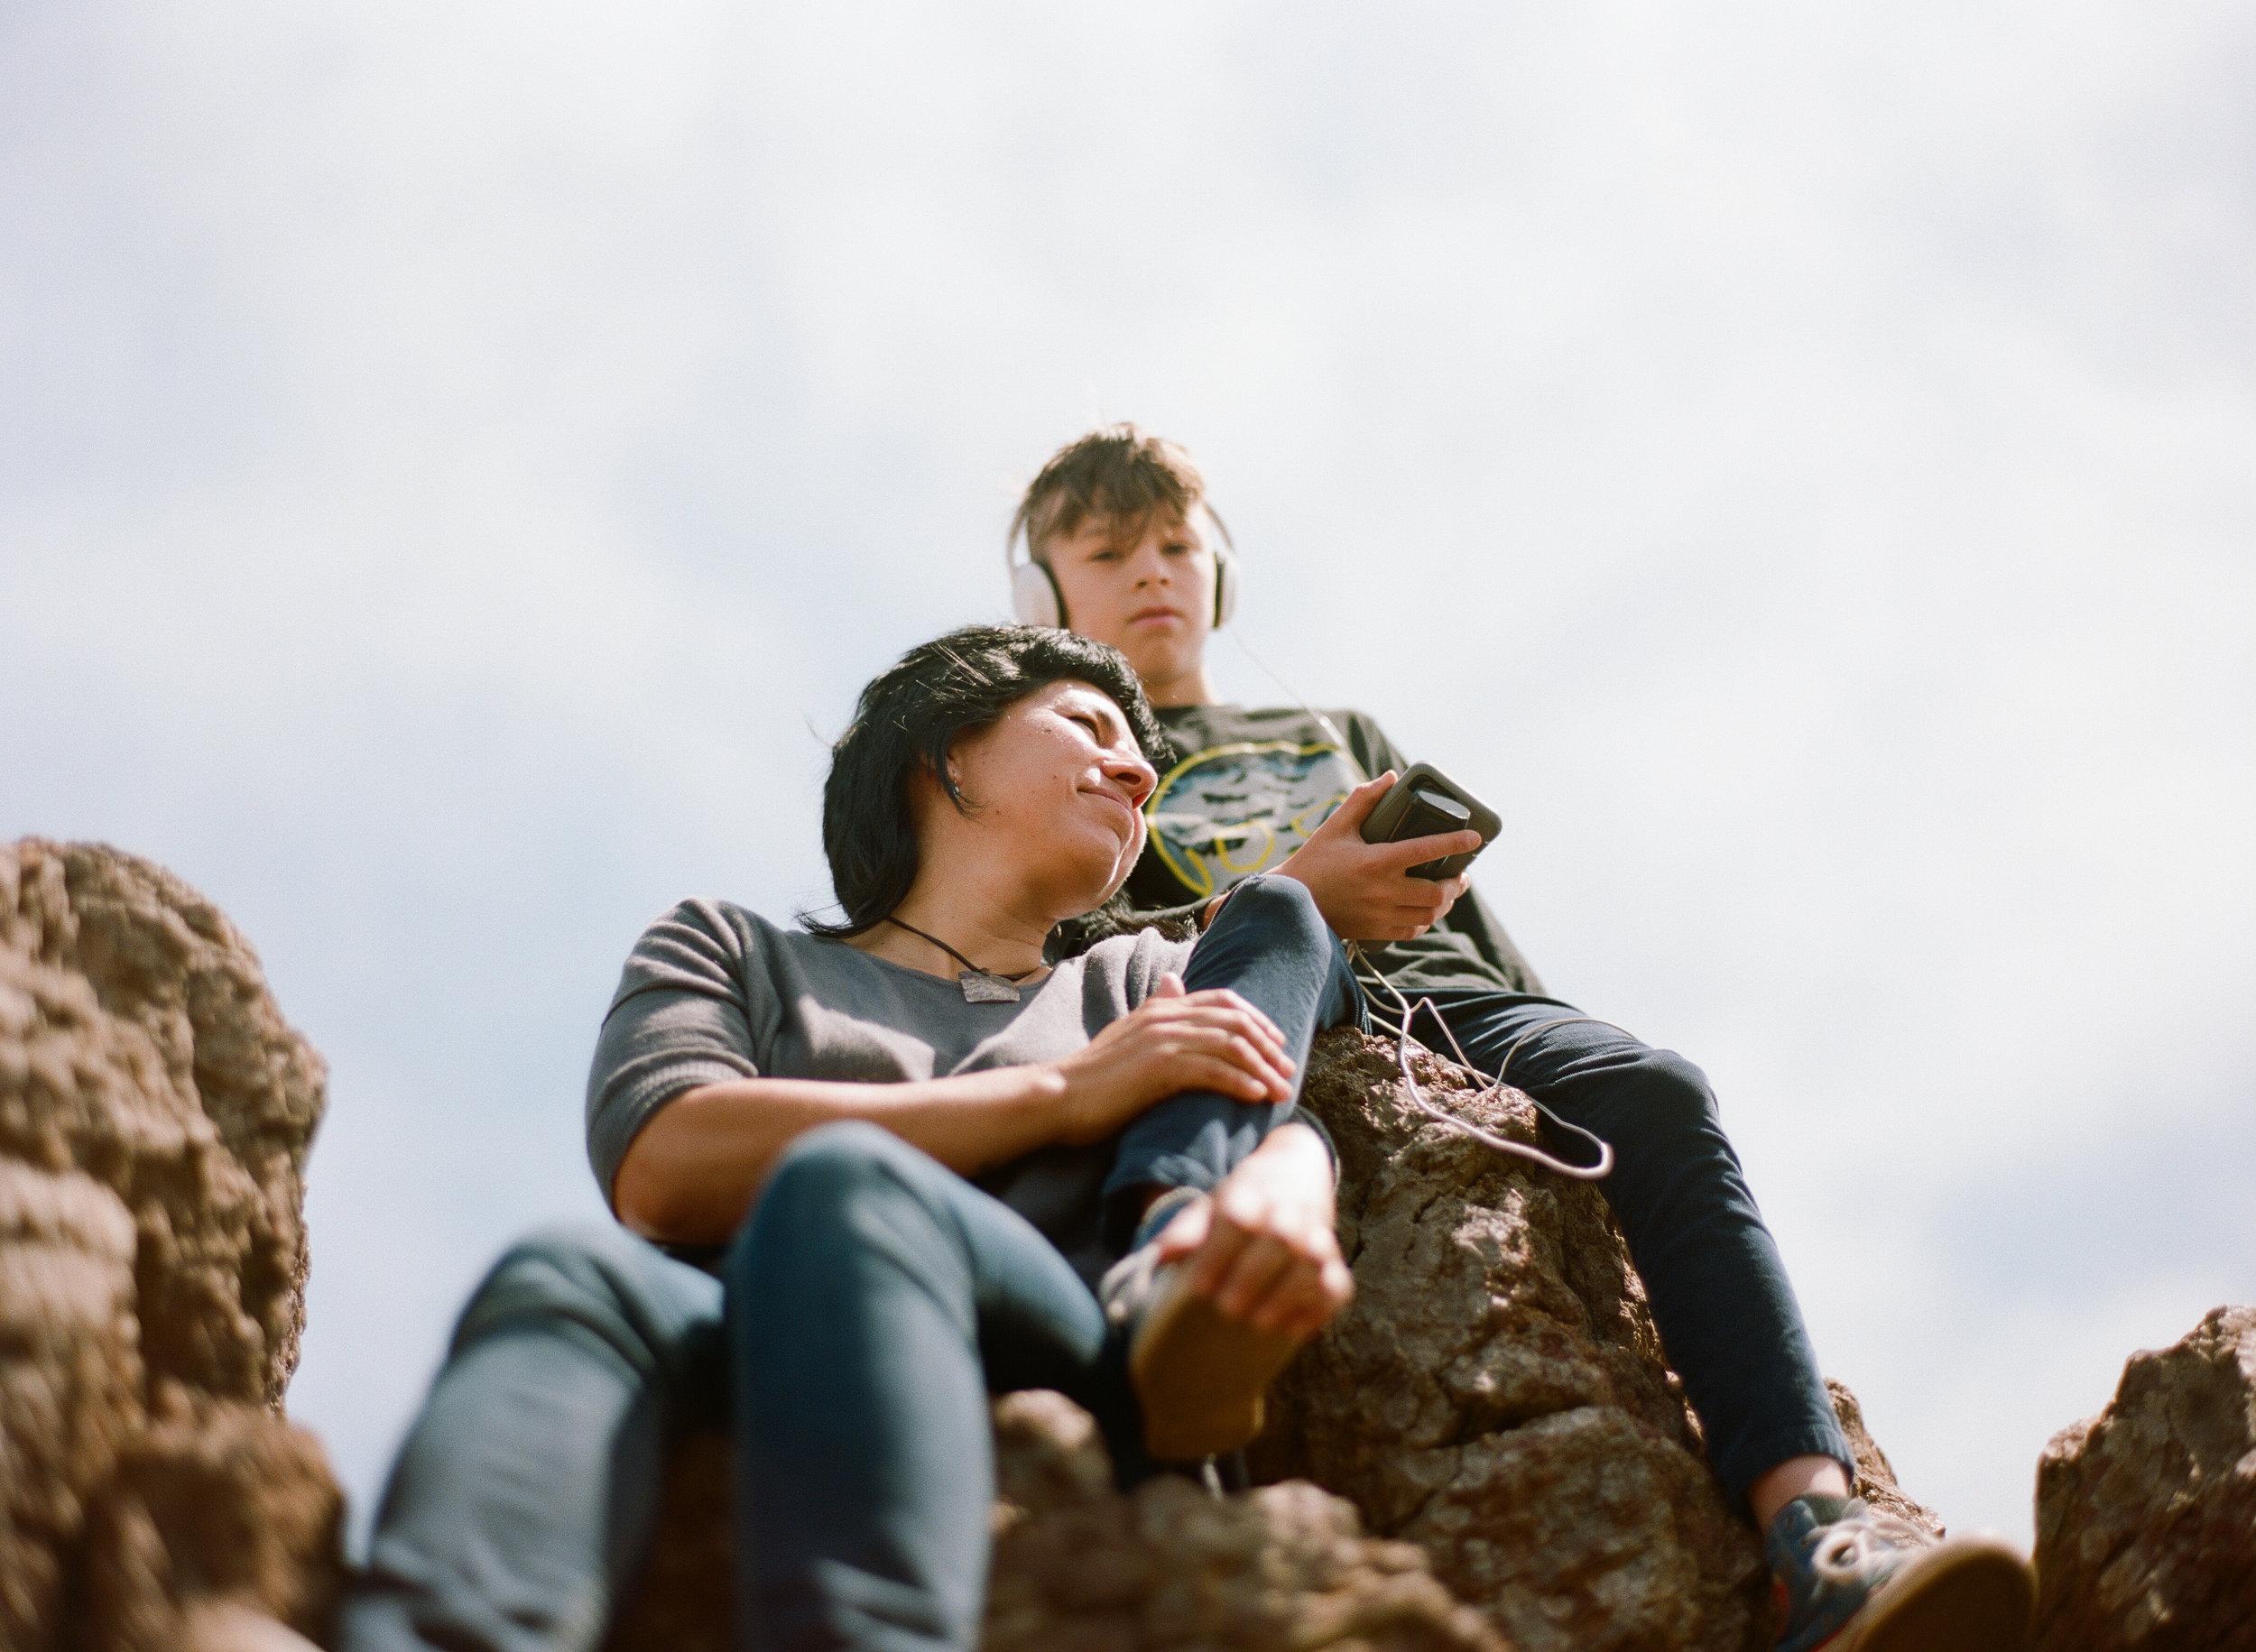 corona-heights-family-photography-photographer-film-art